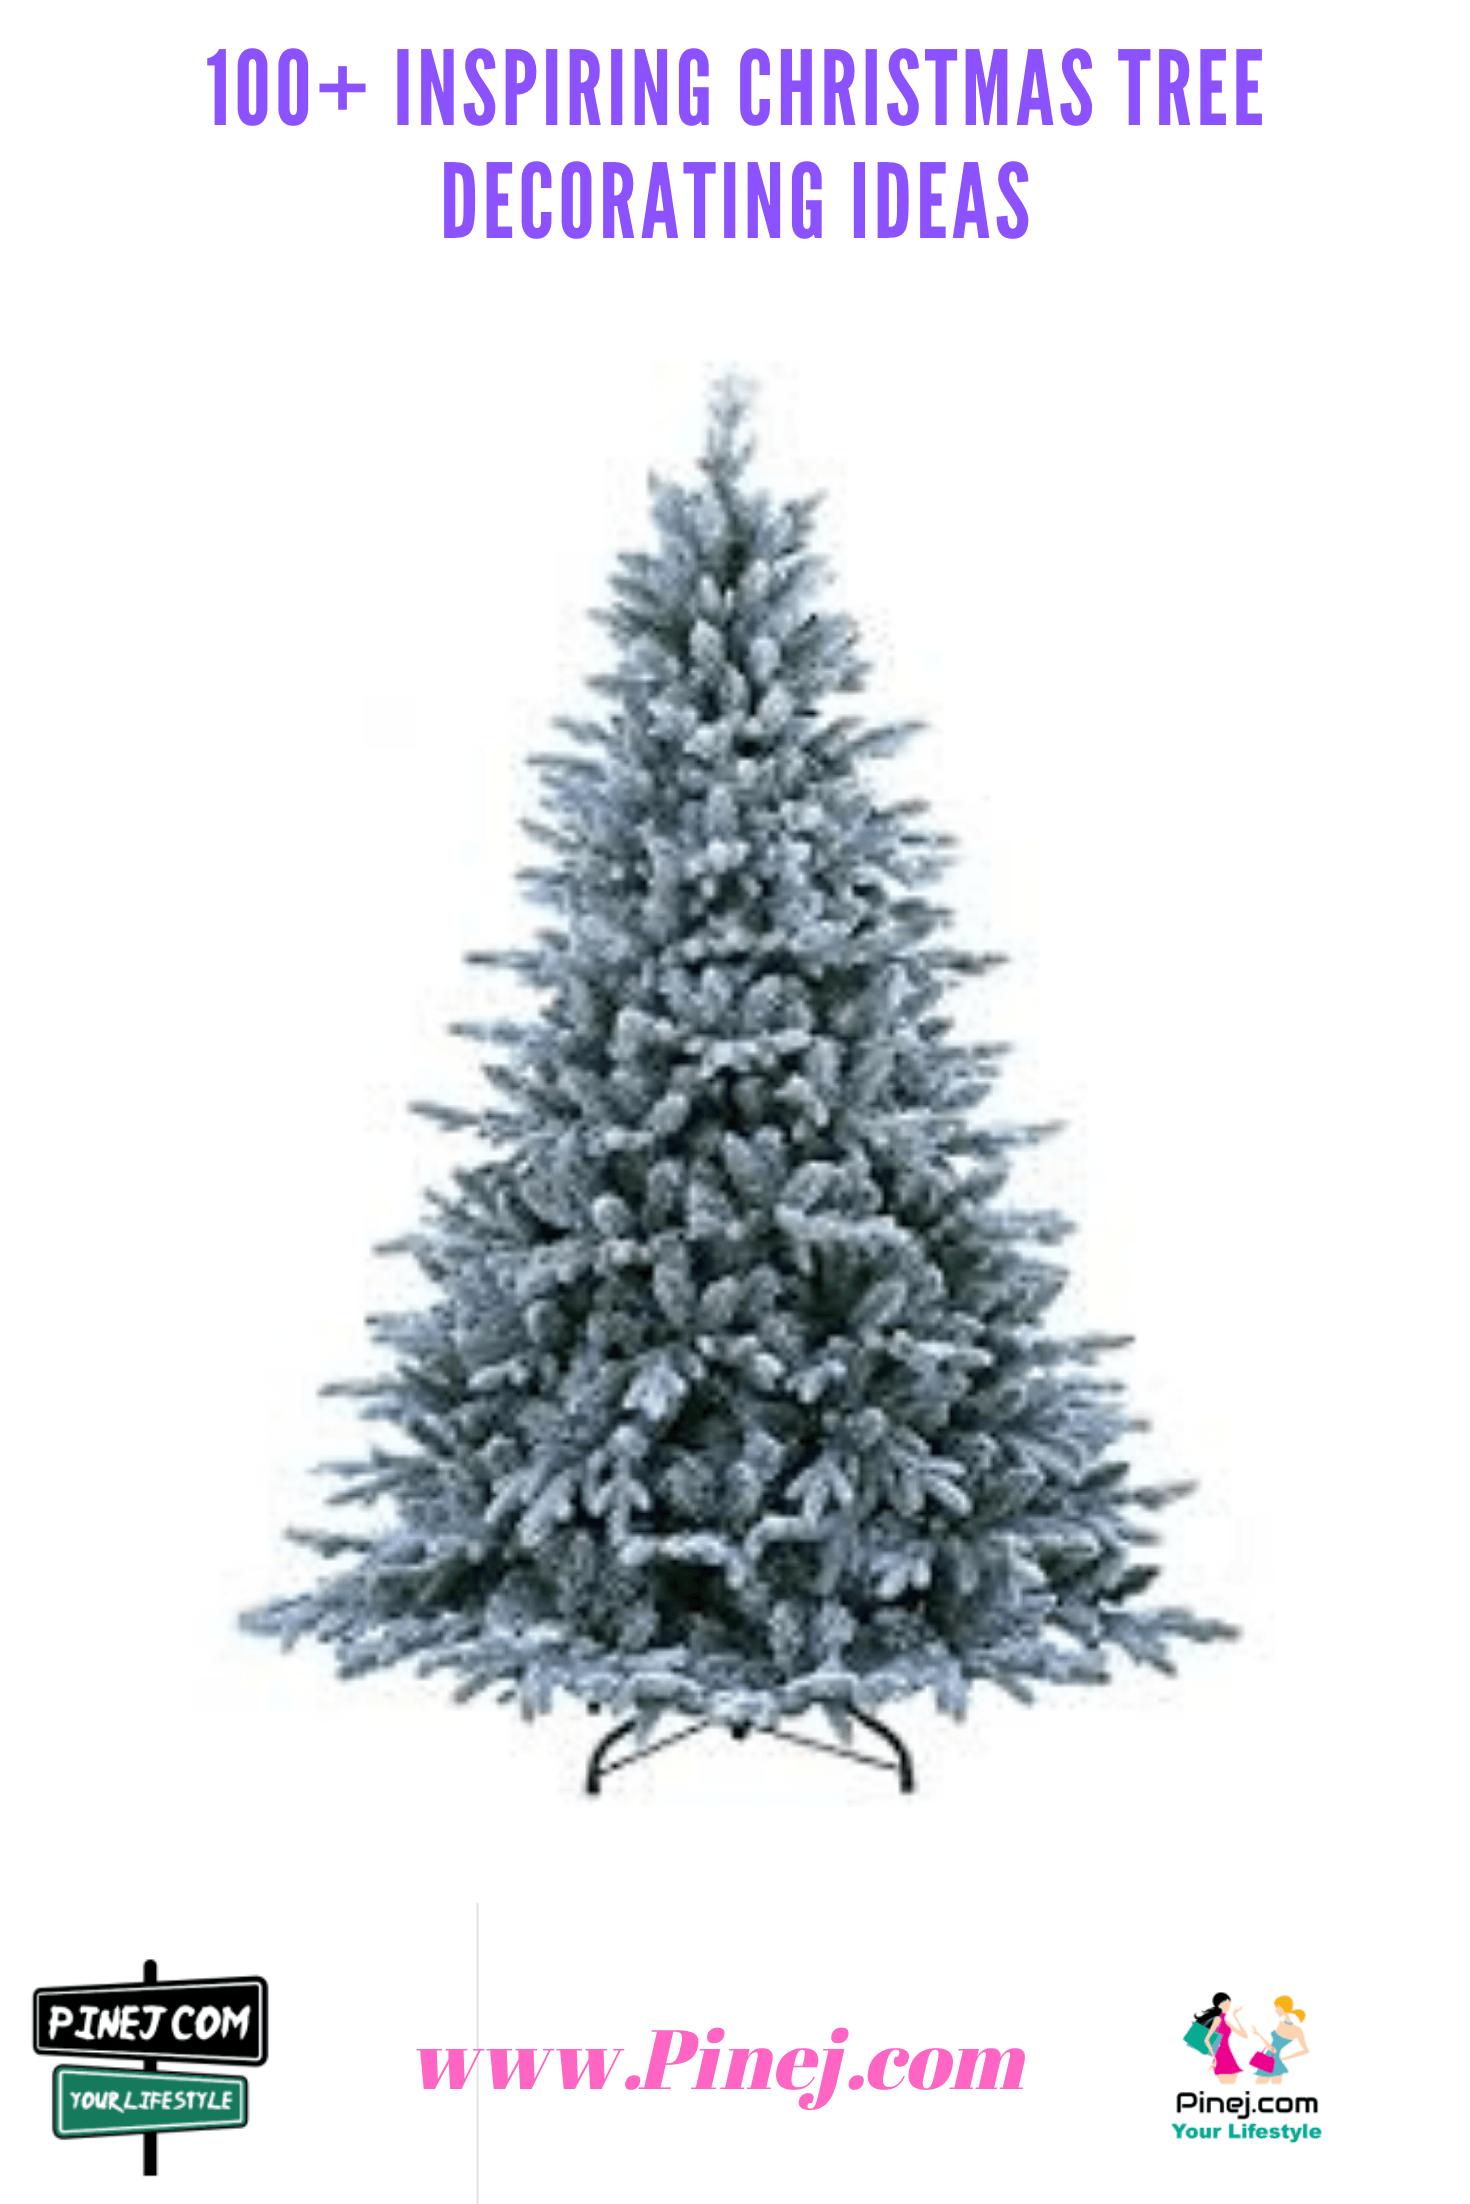 100 Inspiring Christmas Tree Decorating Ideas Christmas Tree Decorations Christmas Tree Prices Tree Decorations